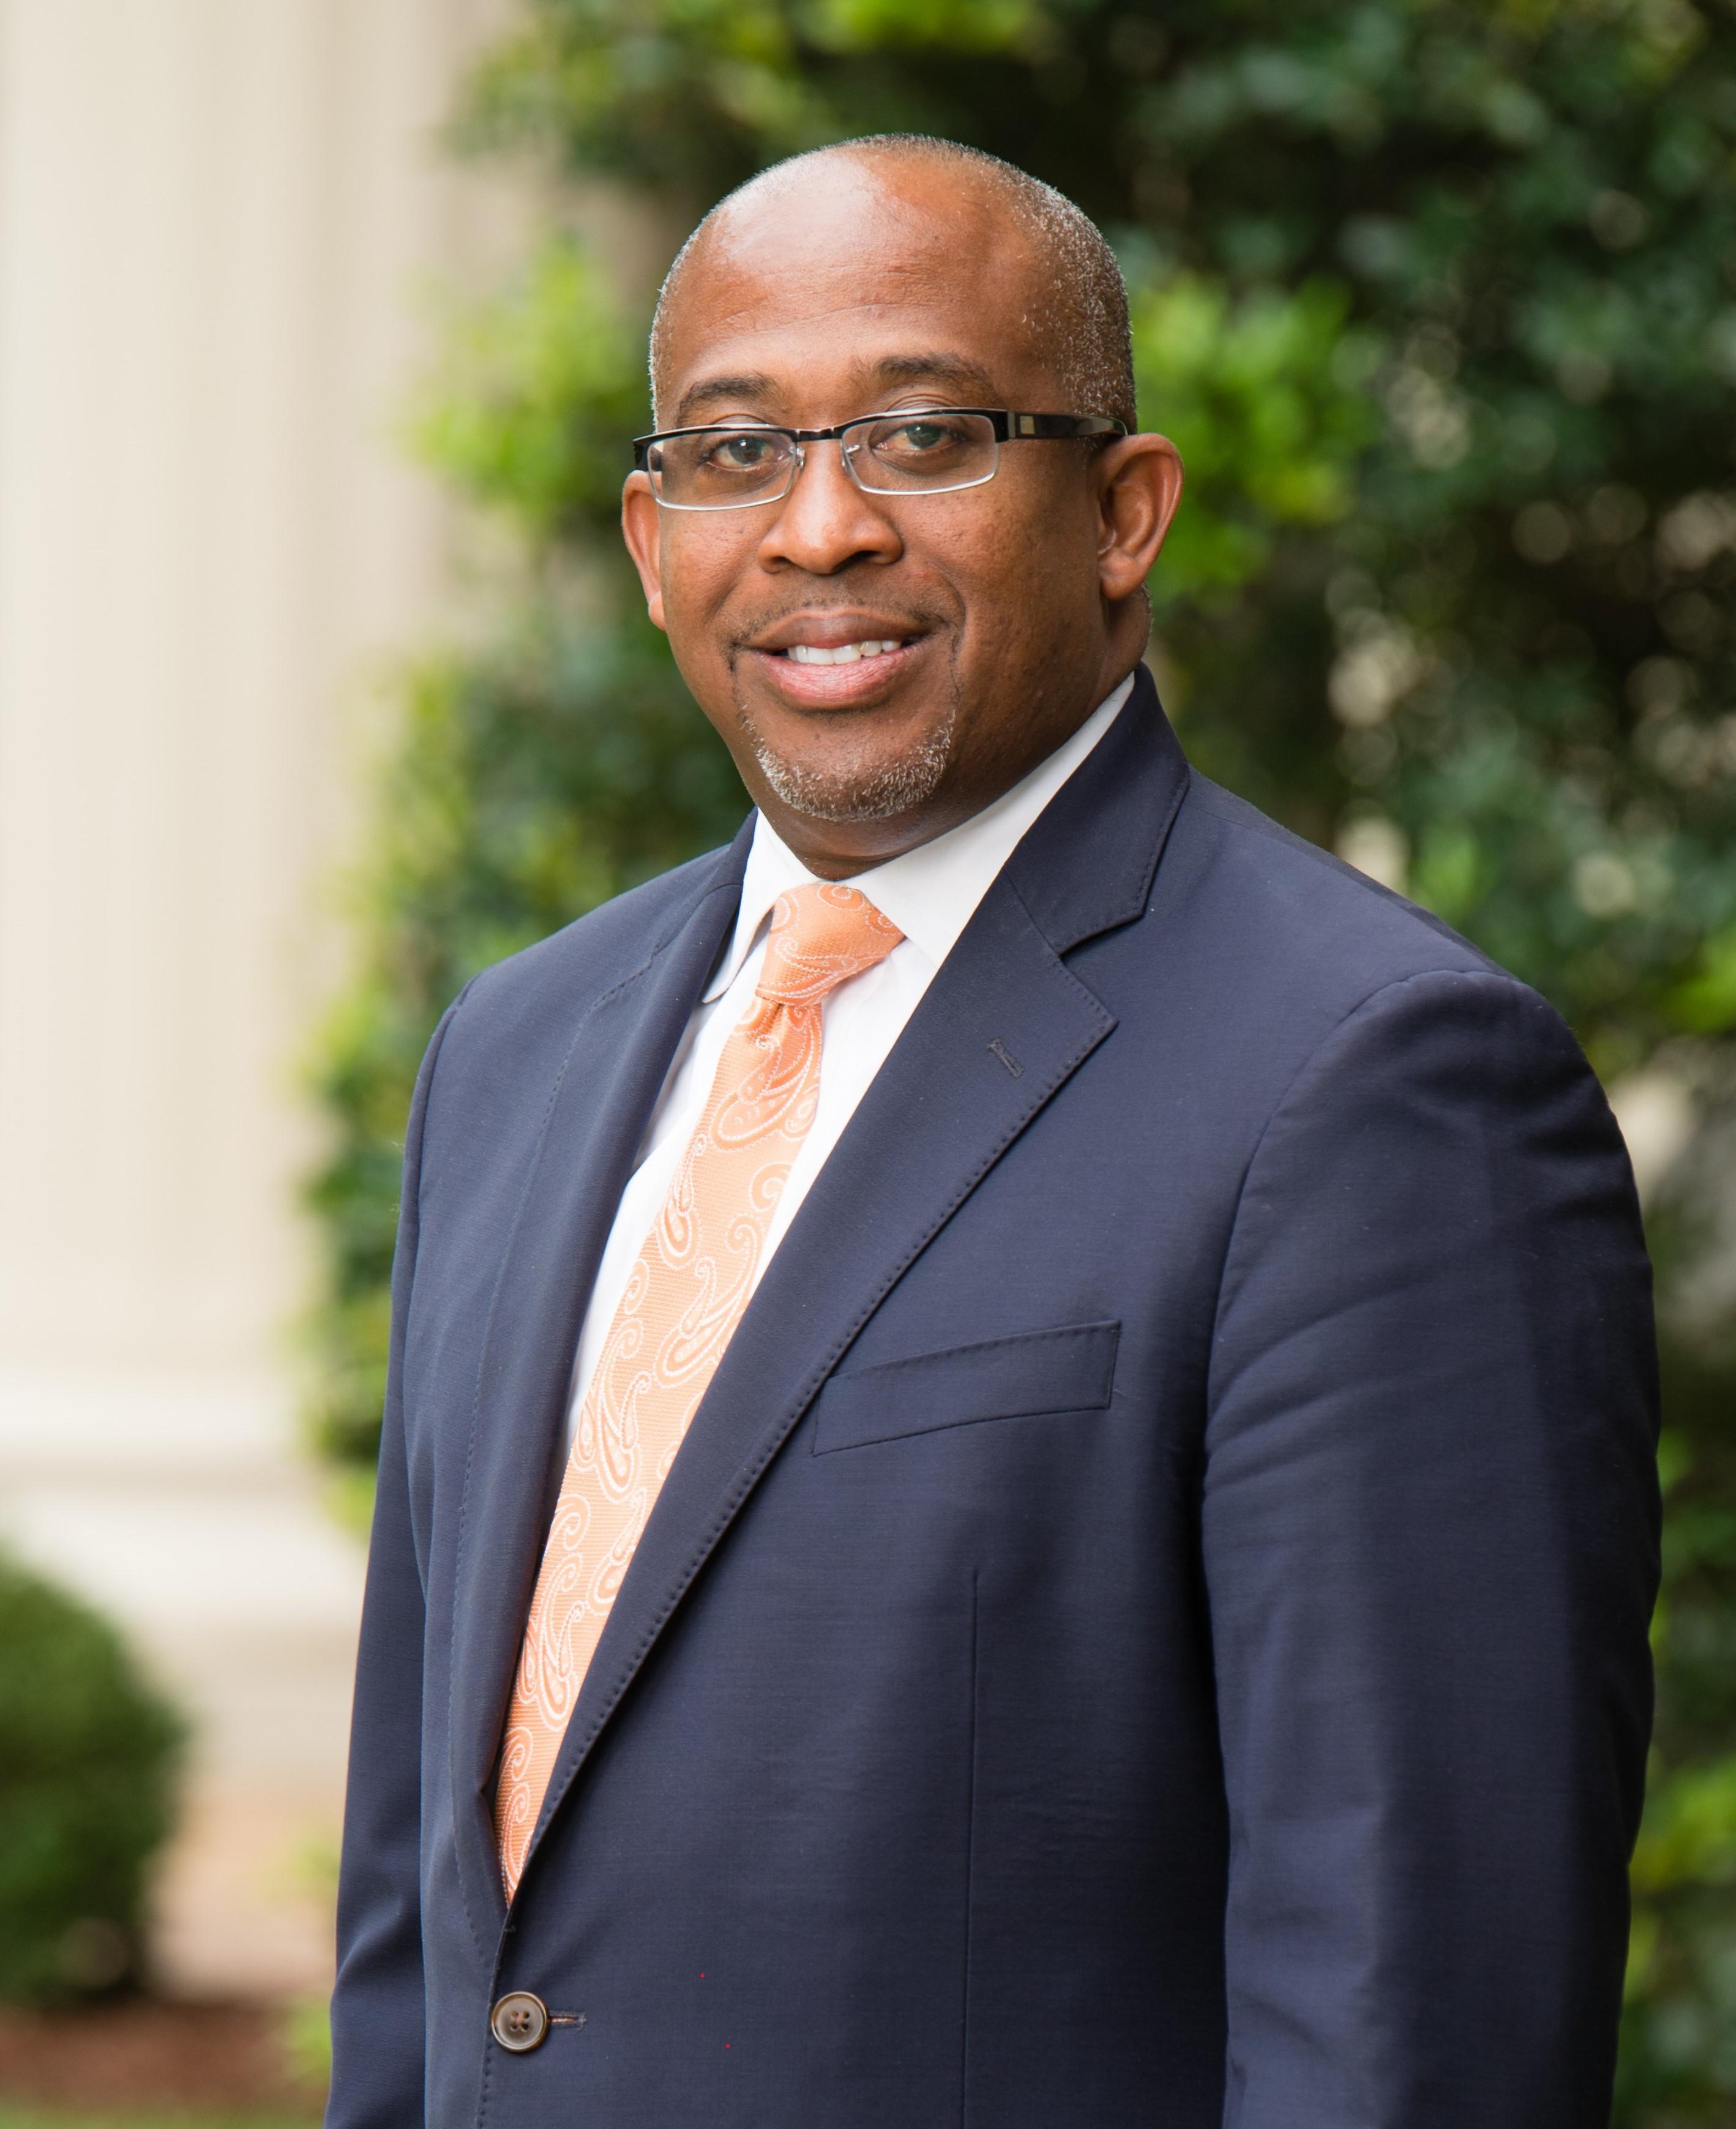 photo of Ryan Marsh - Associate Managing Director of the Atlantic Coast Business Center